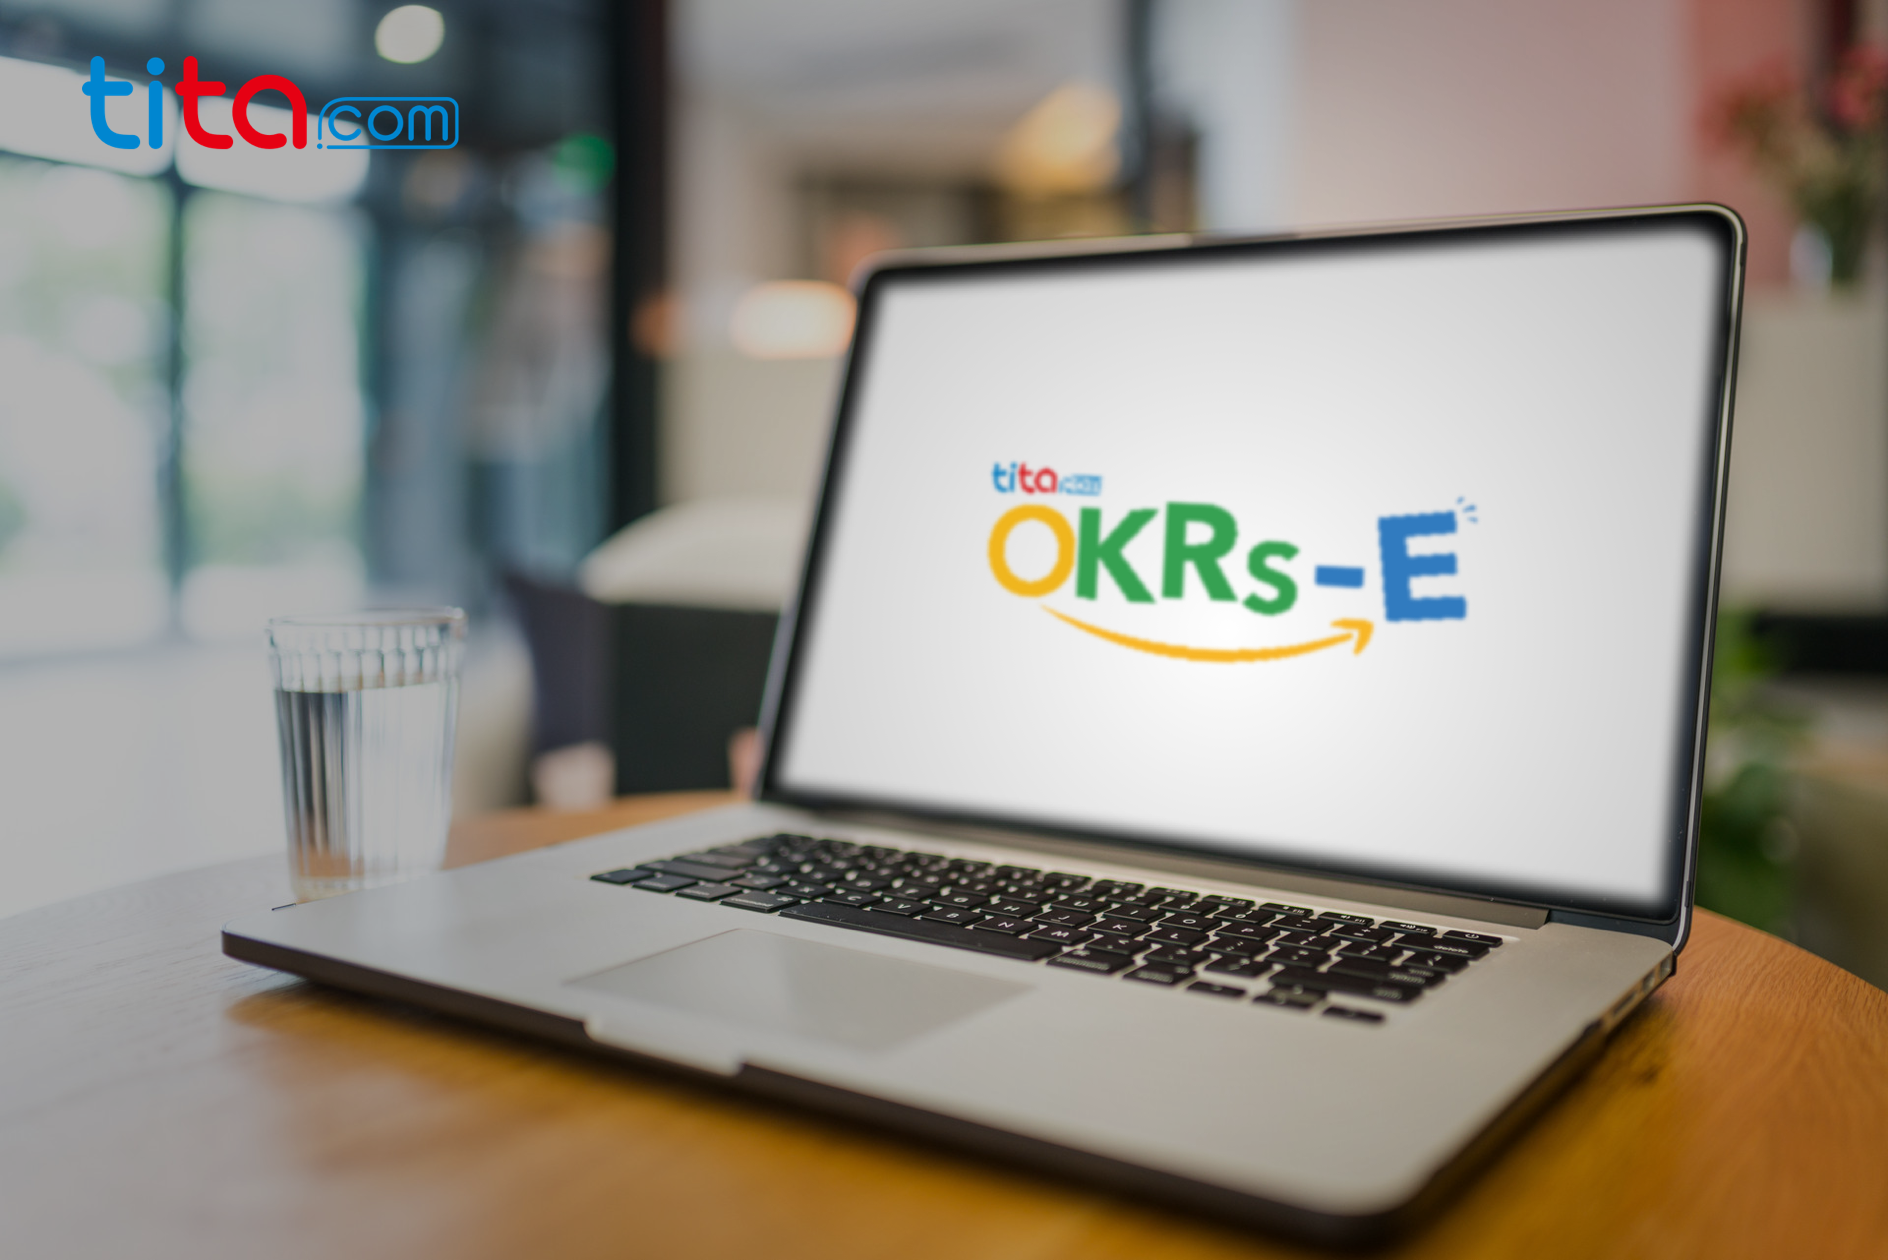 OKRs—E框架